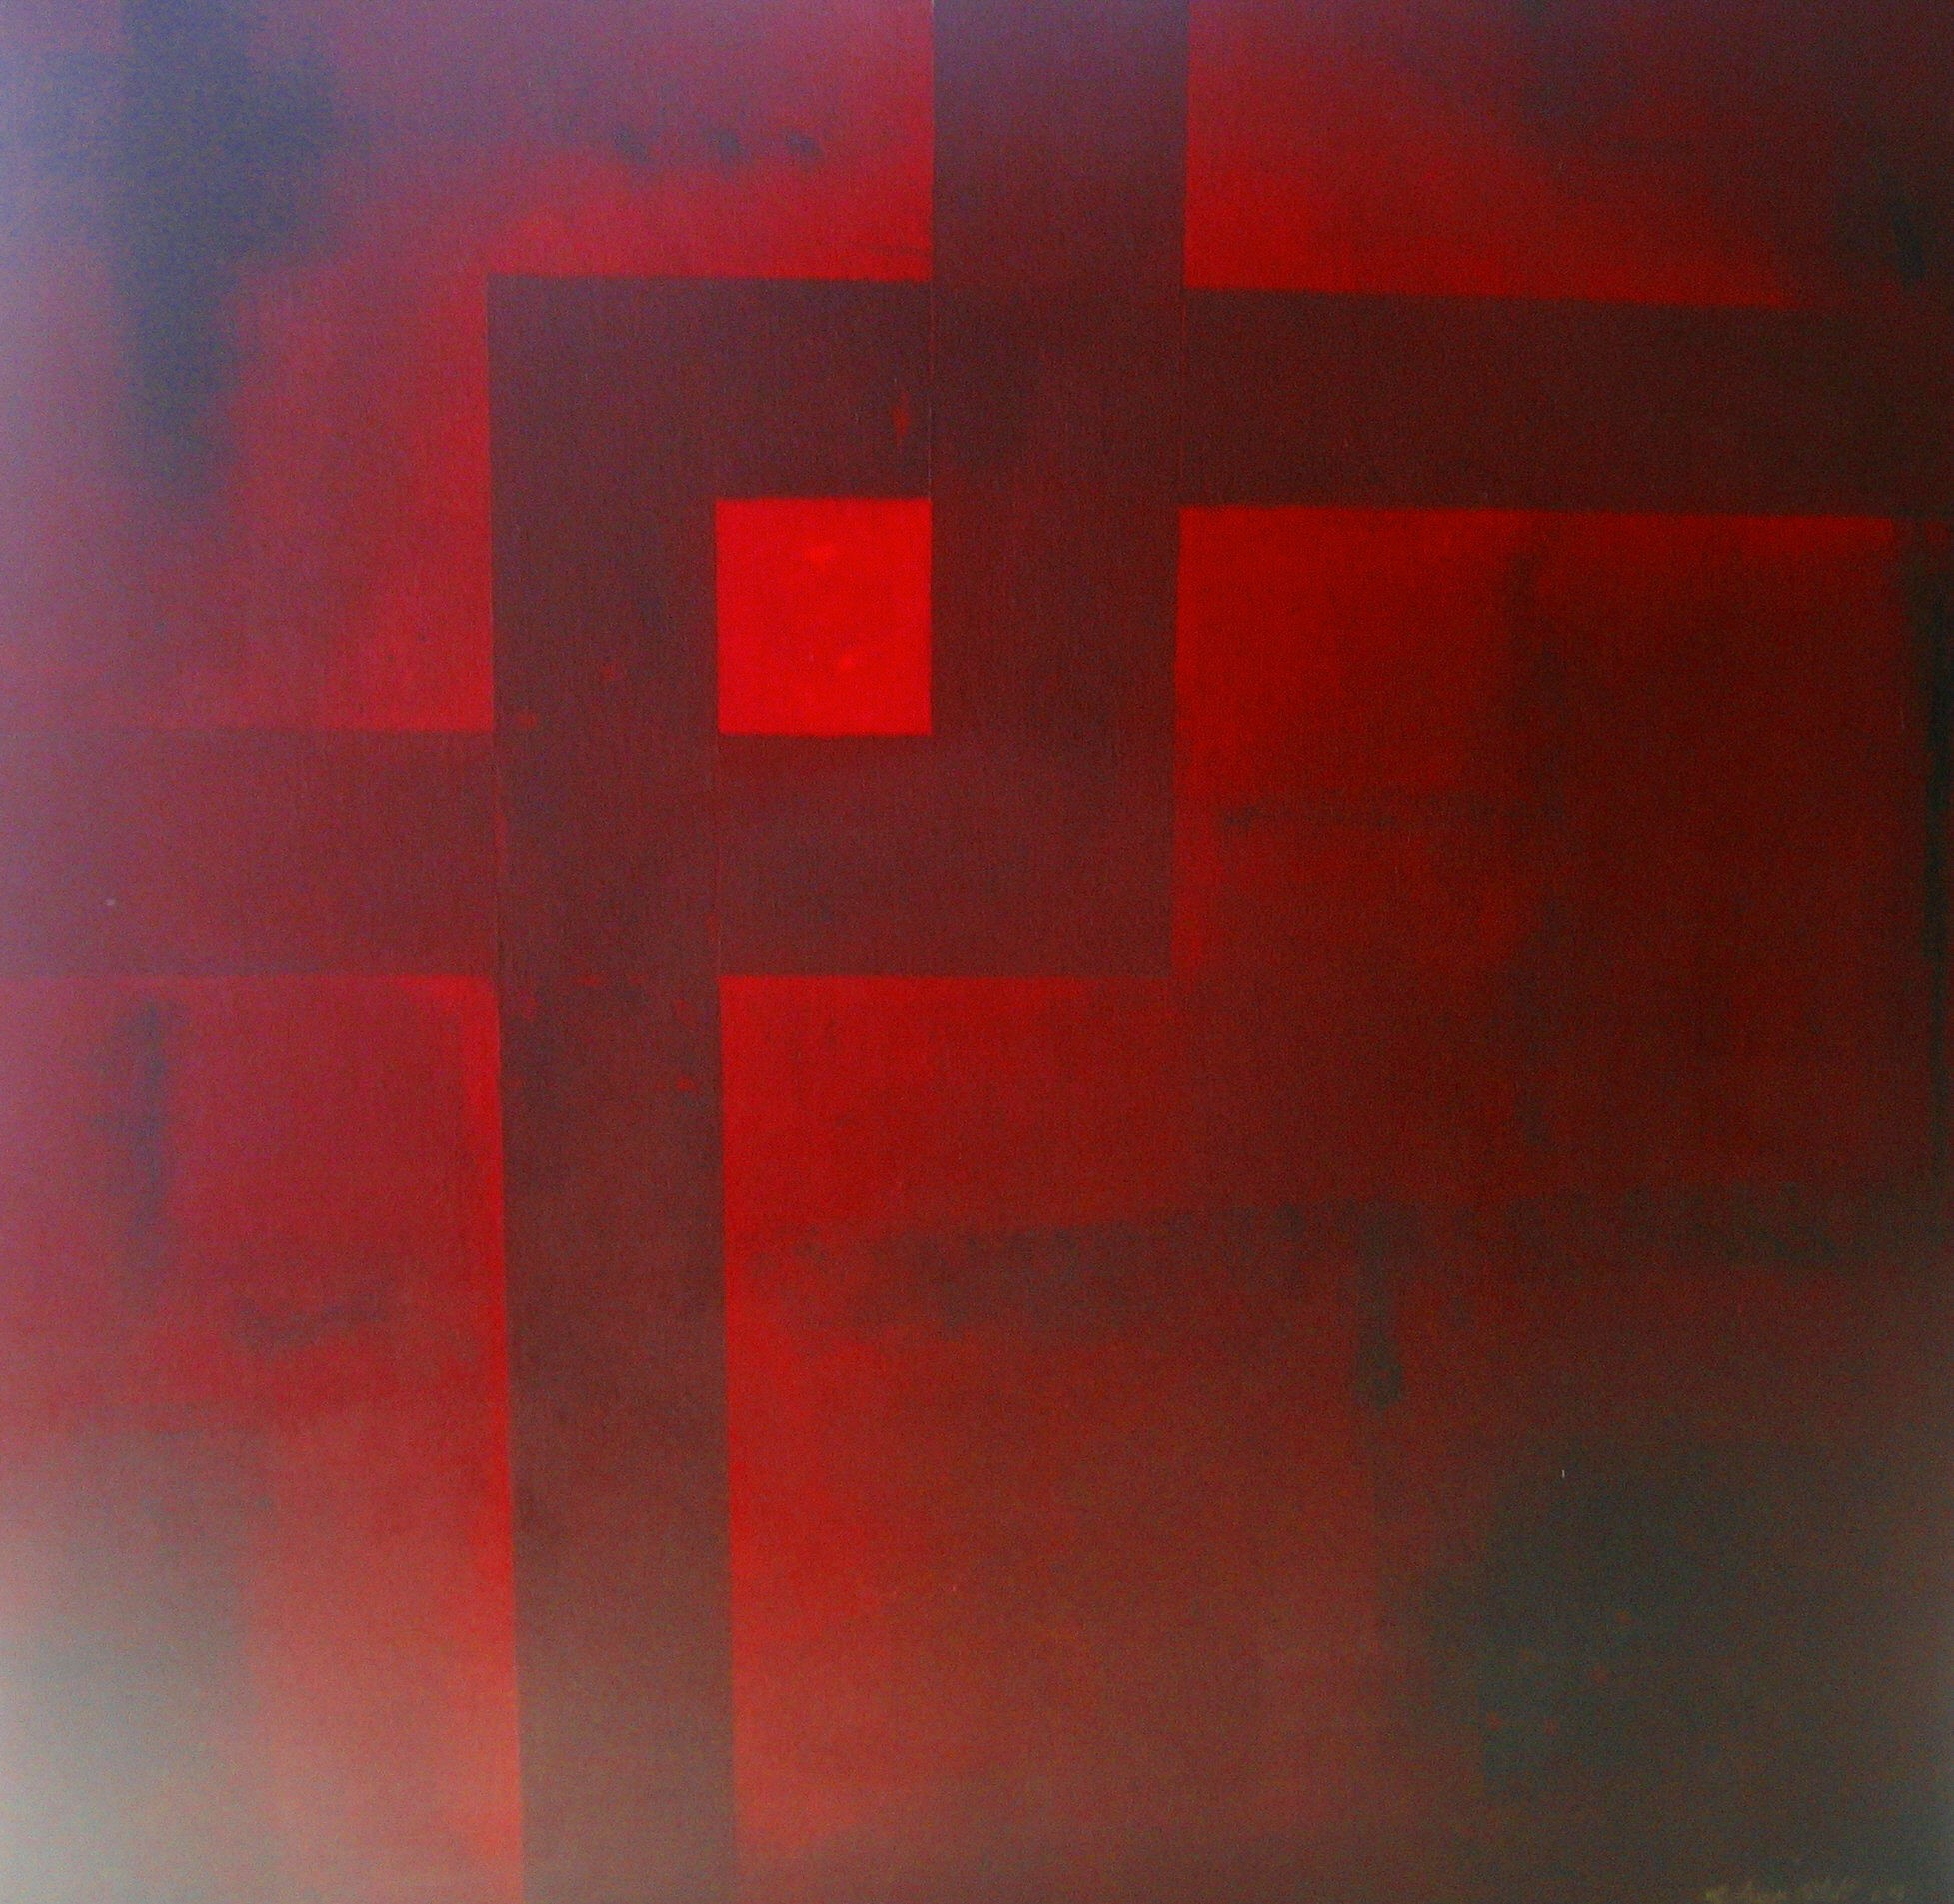 Schnittmenge II, Acryl auf Leinwand, 70 x 70 cm